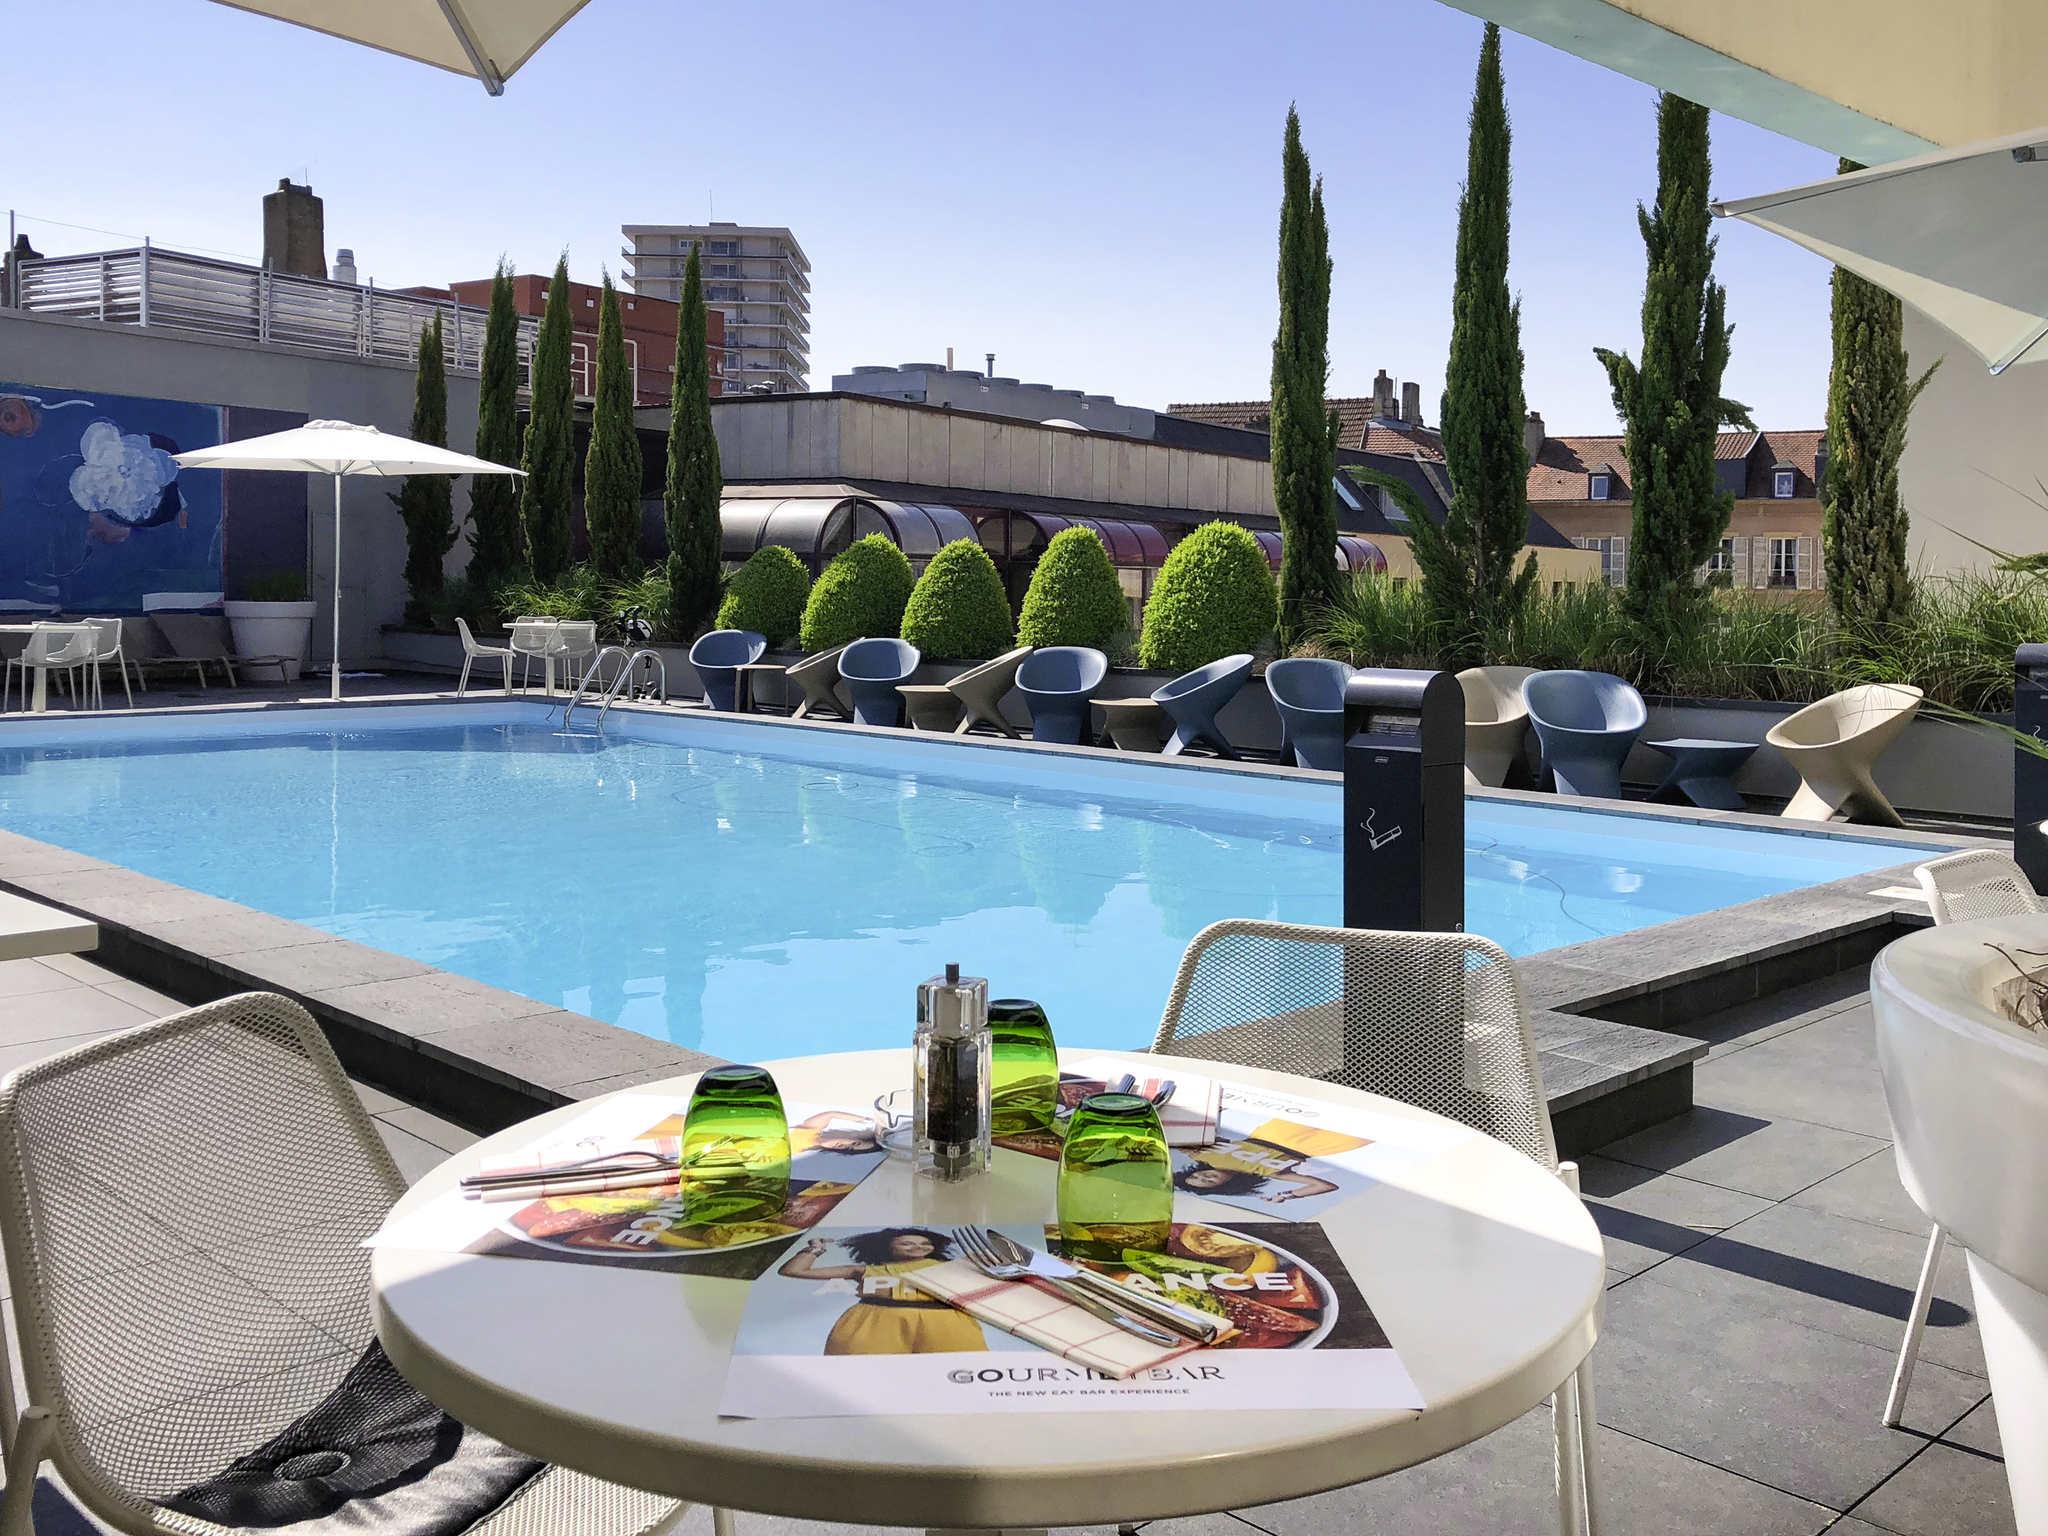 Hotel In Metz Novotel Metz Centre